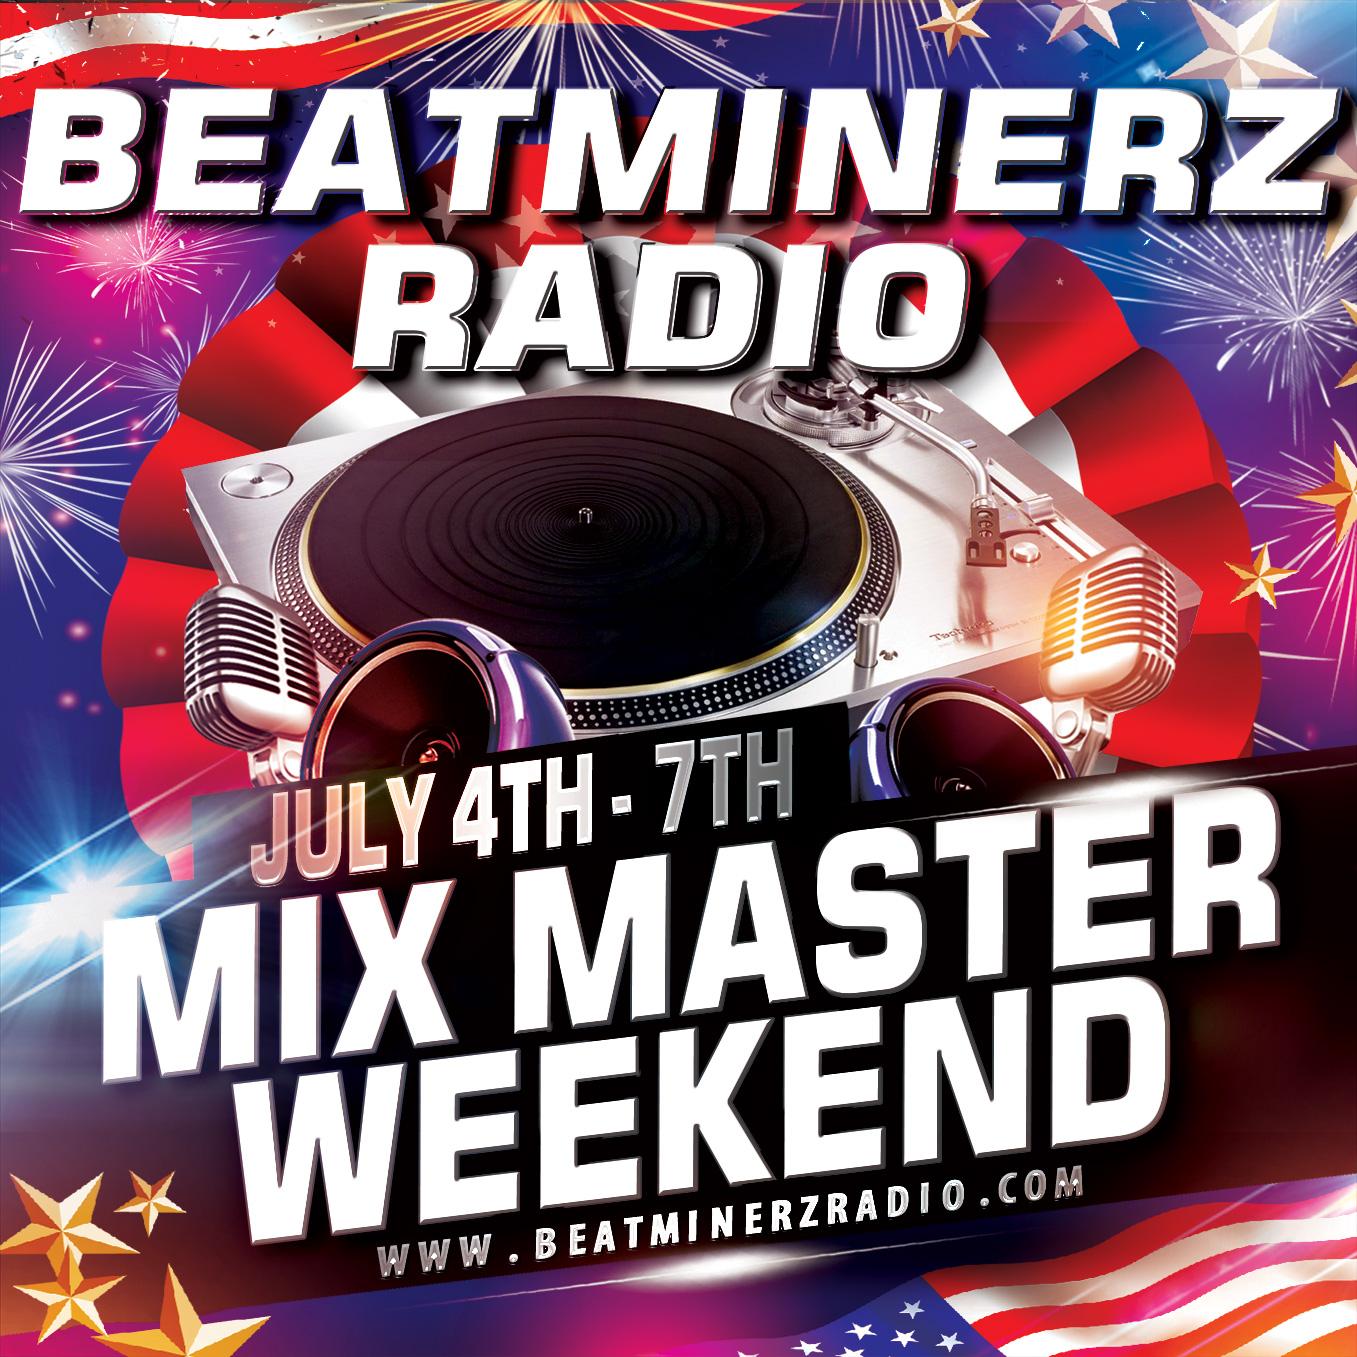 Beatminerz Radio July 4th 2019 Mixmaster Weekend